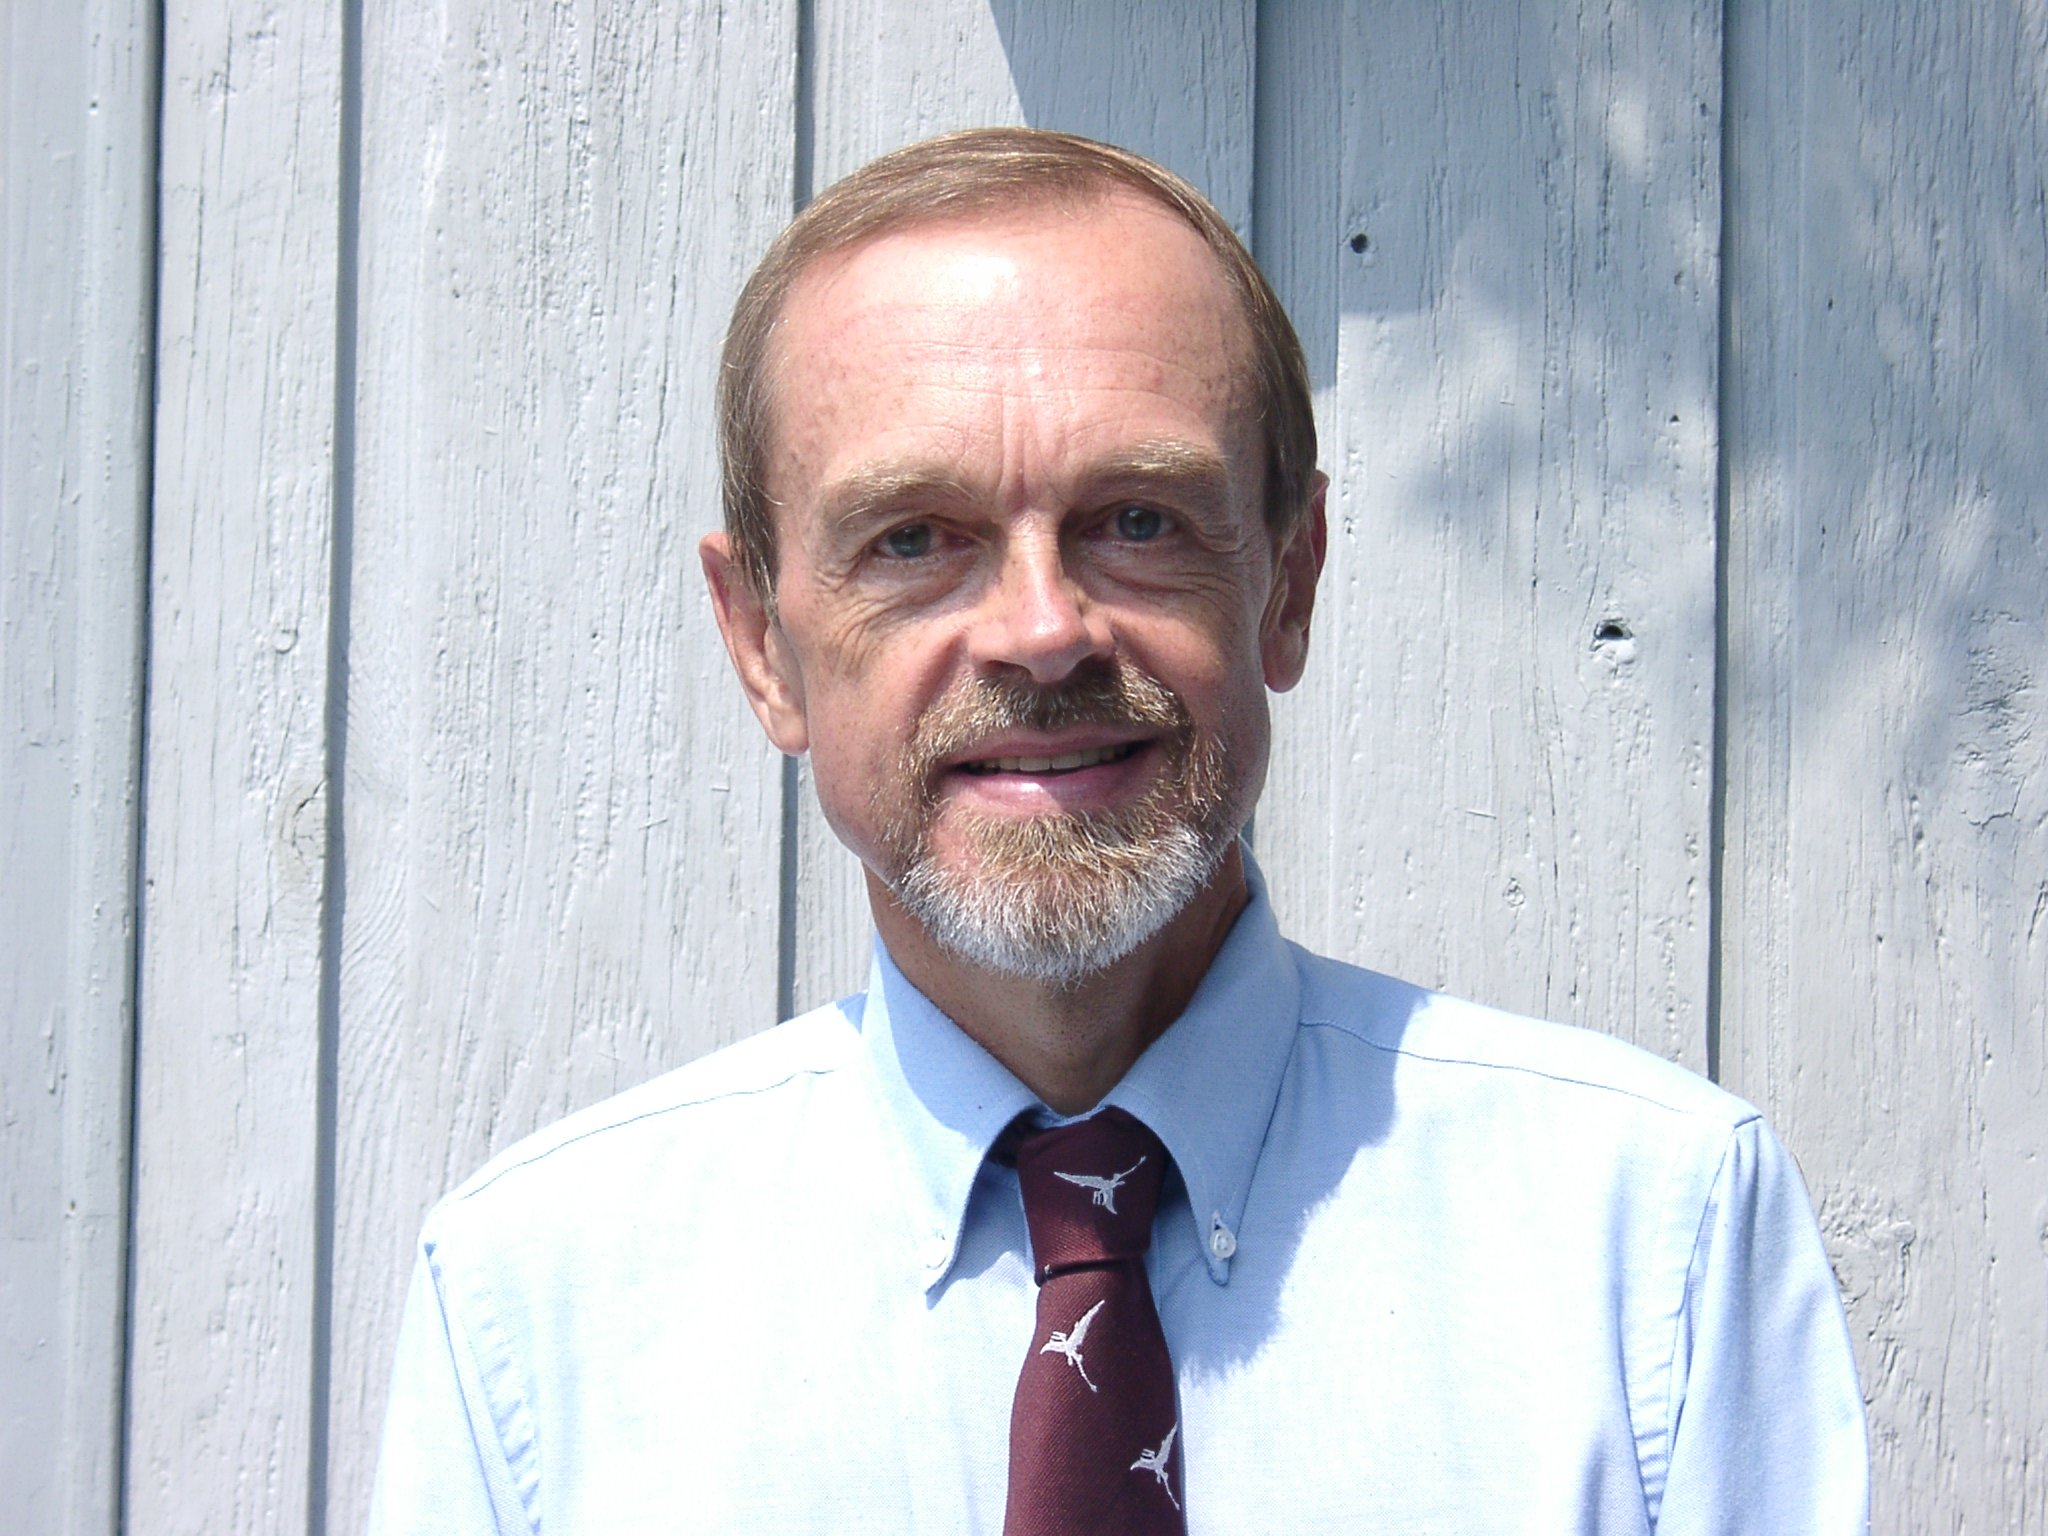 'Life After Faith' author Philip Kitcher